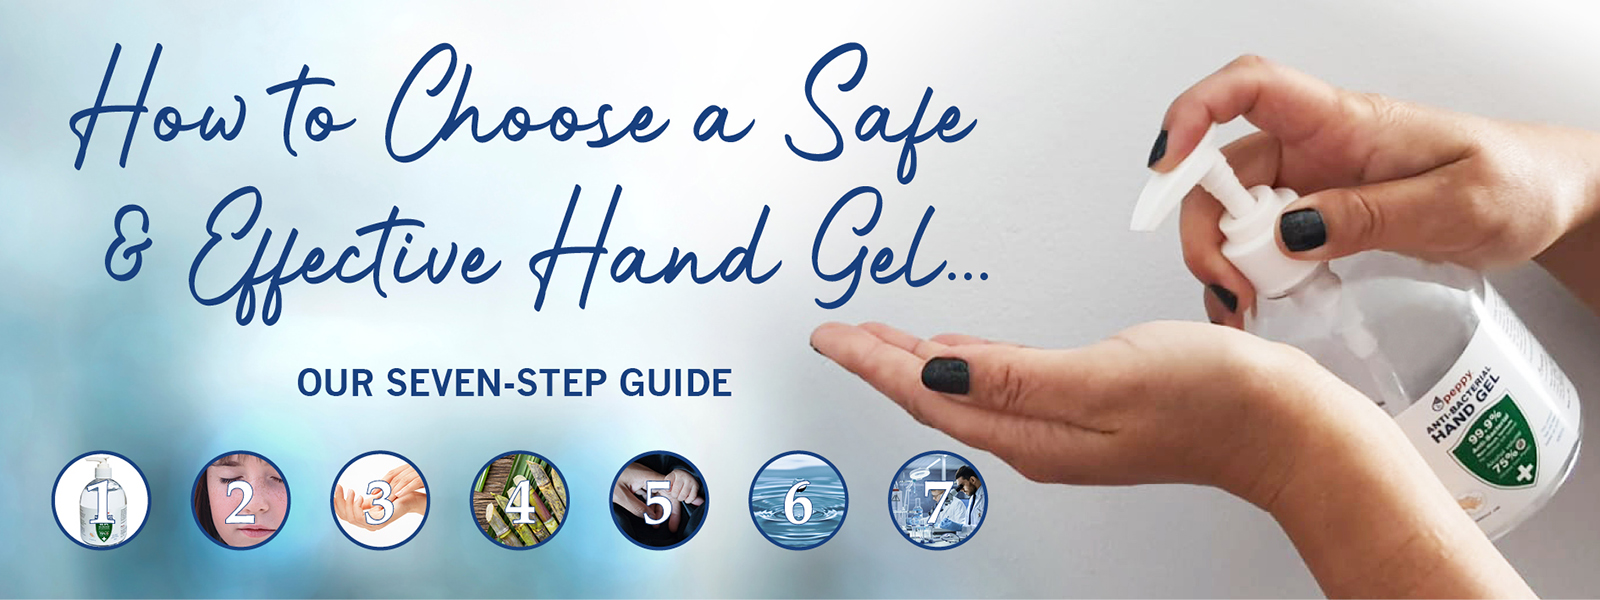 Hand Gel Guide